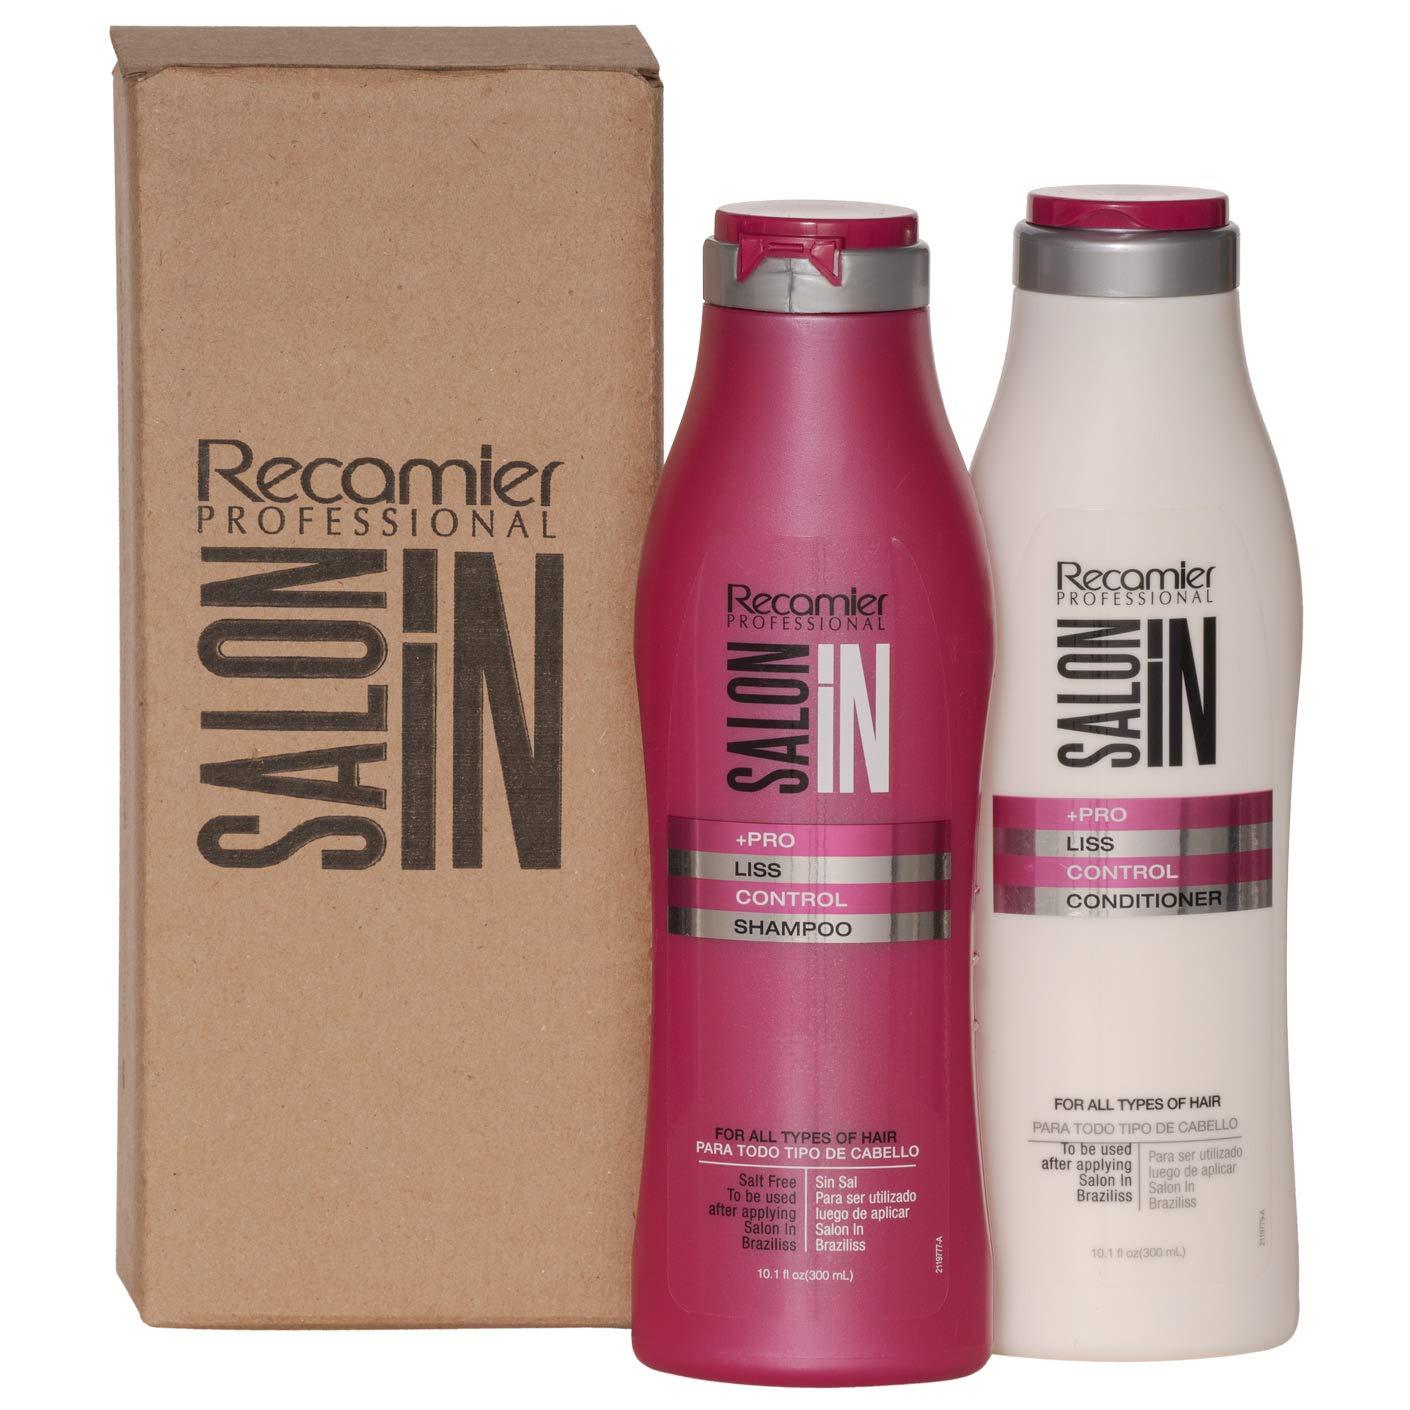 RECAMIER Tulsa Mall Anti Frizz Cheap mail order sales Shampoo Conditioner Cha Treatment Hair Set